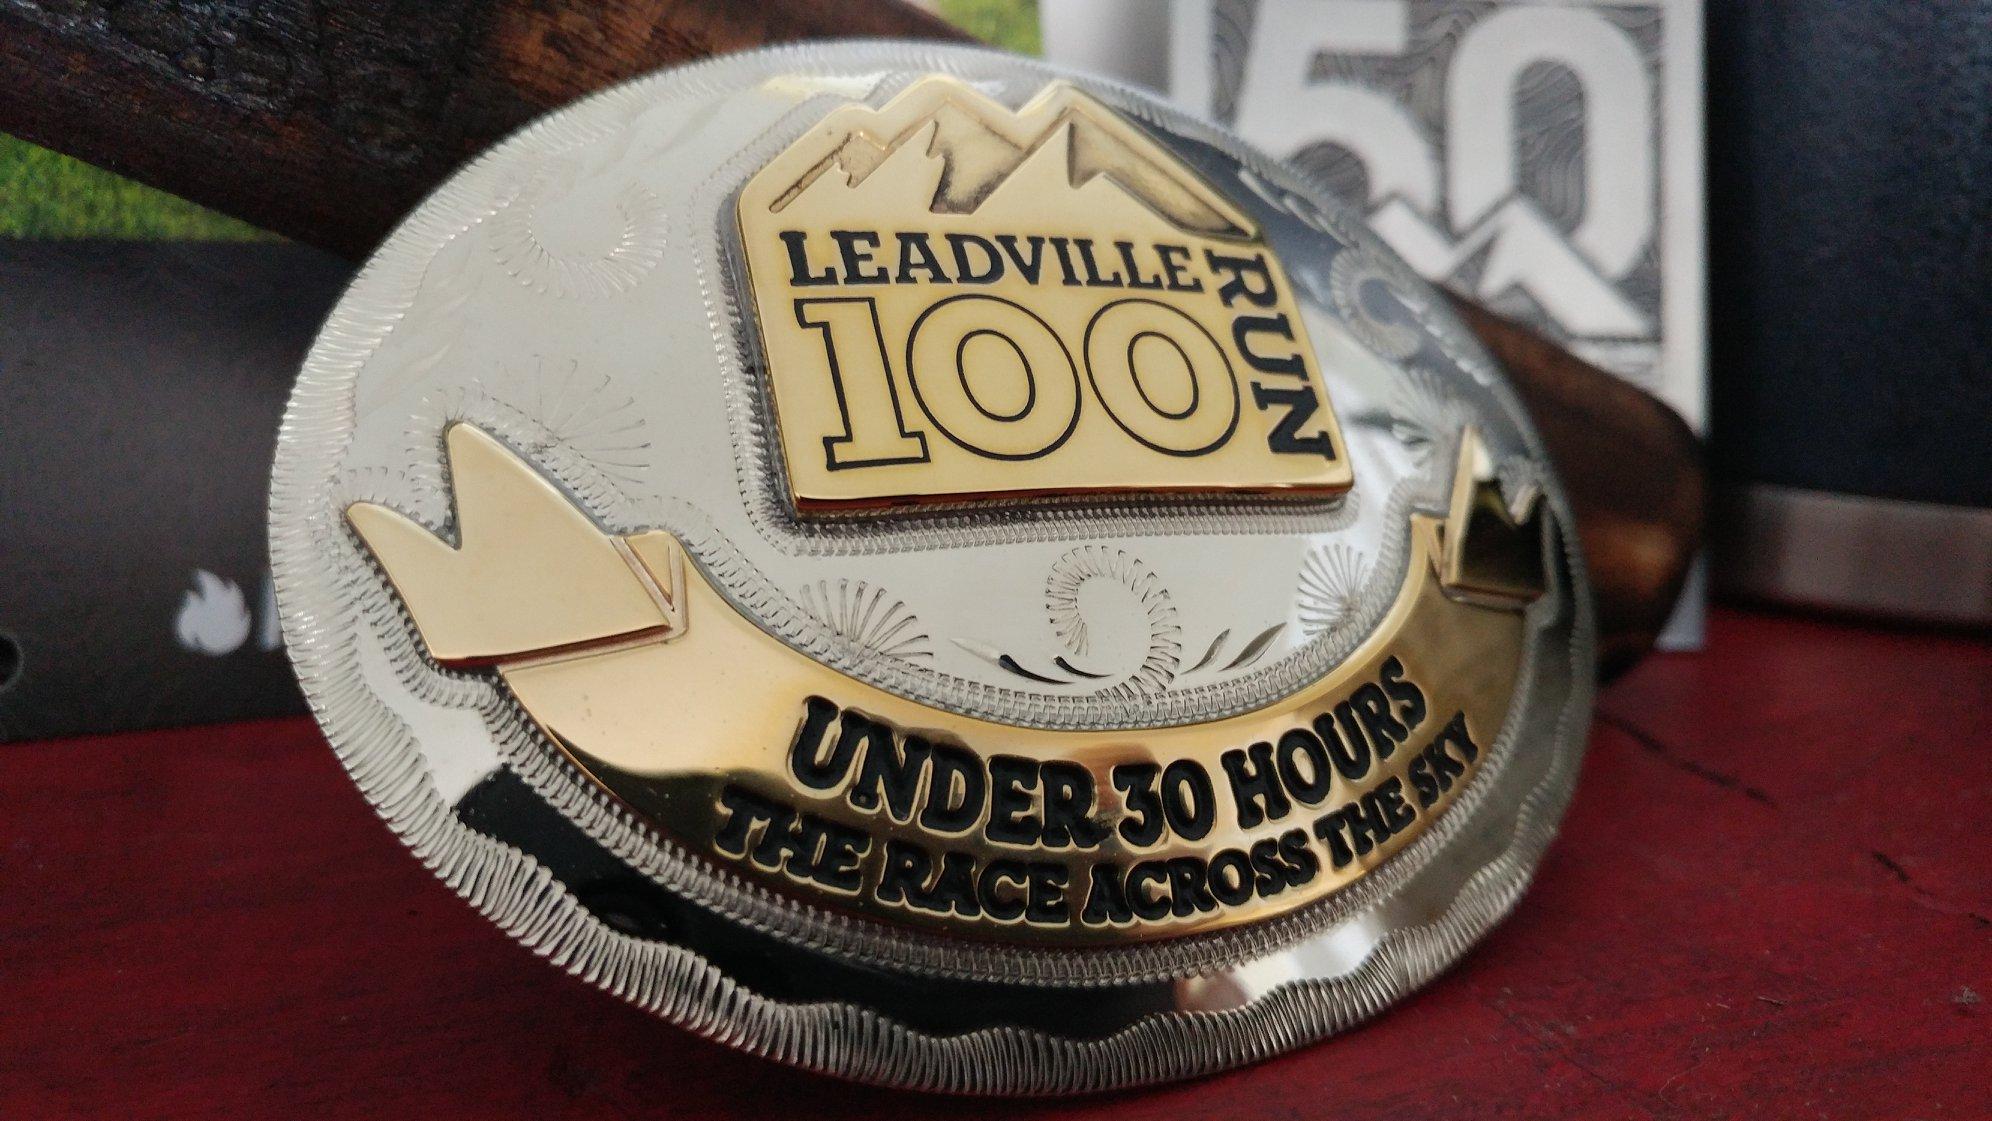 Coach_Terry_Wilson_Pursuit_of_The_Perfect_Race_Leadville_100_Big_Sexy_Racing_Chris_Whelchel_Finish_Leadman_Buckle.jpg